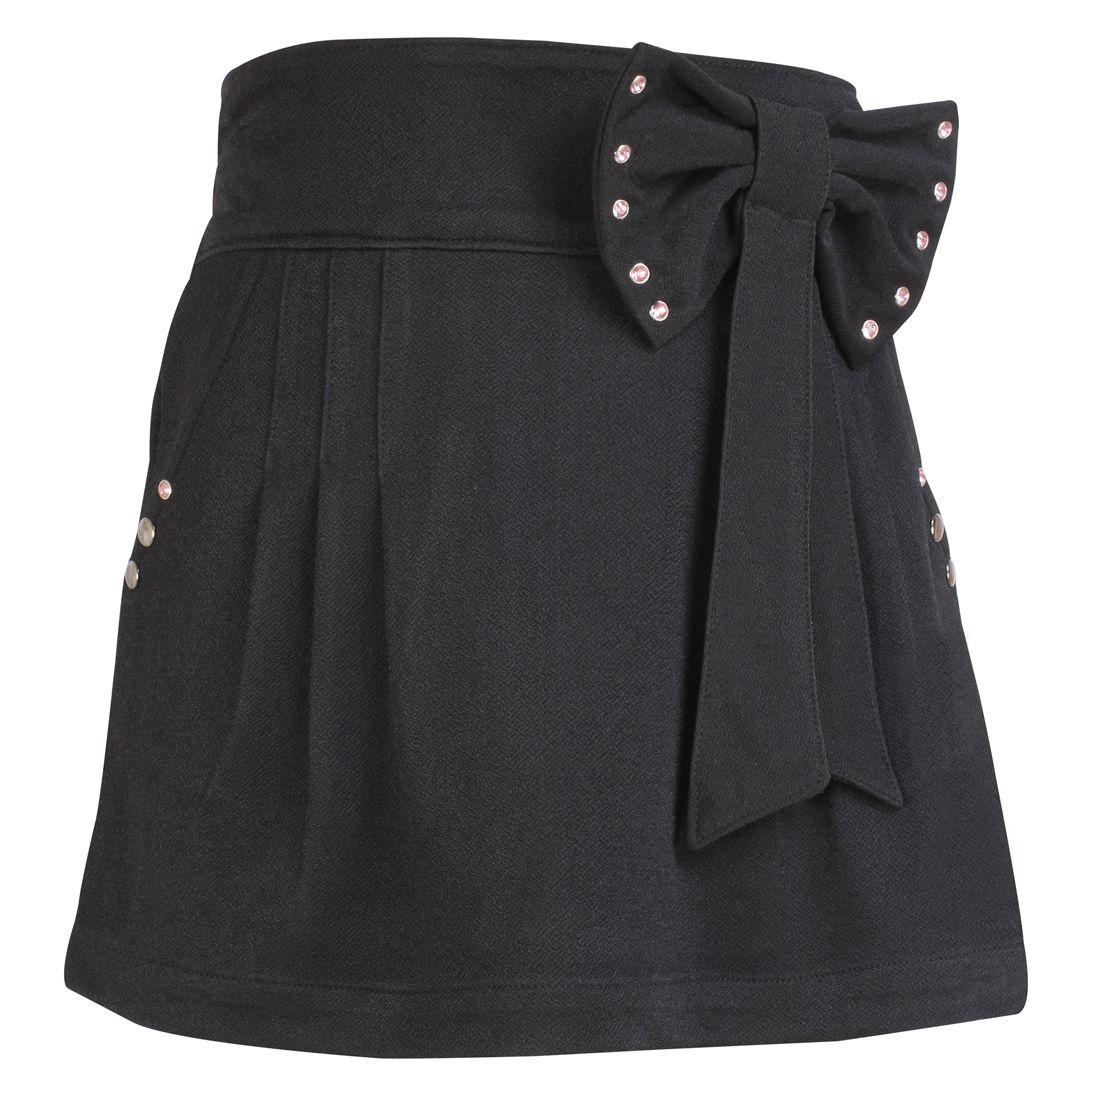 Cutecumber Girls Partywear Popcorn Knit Skorts